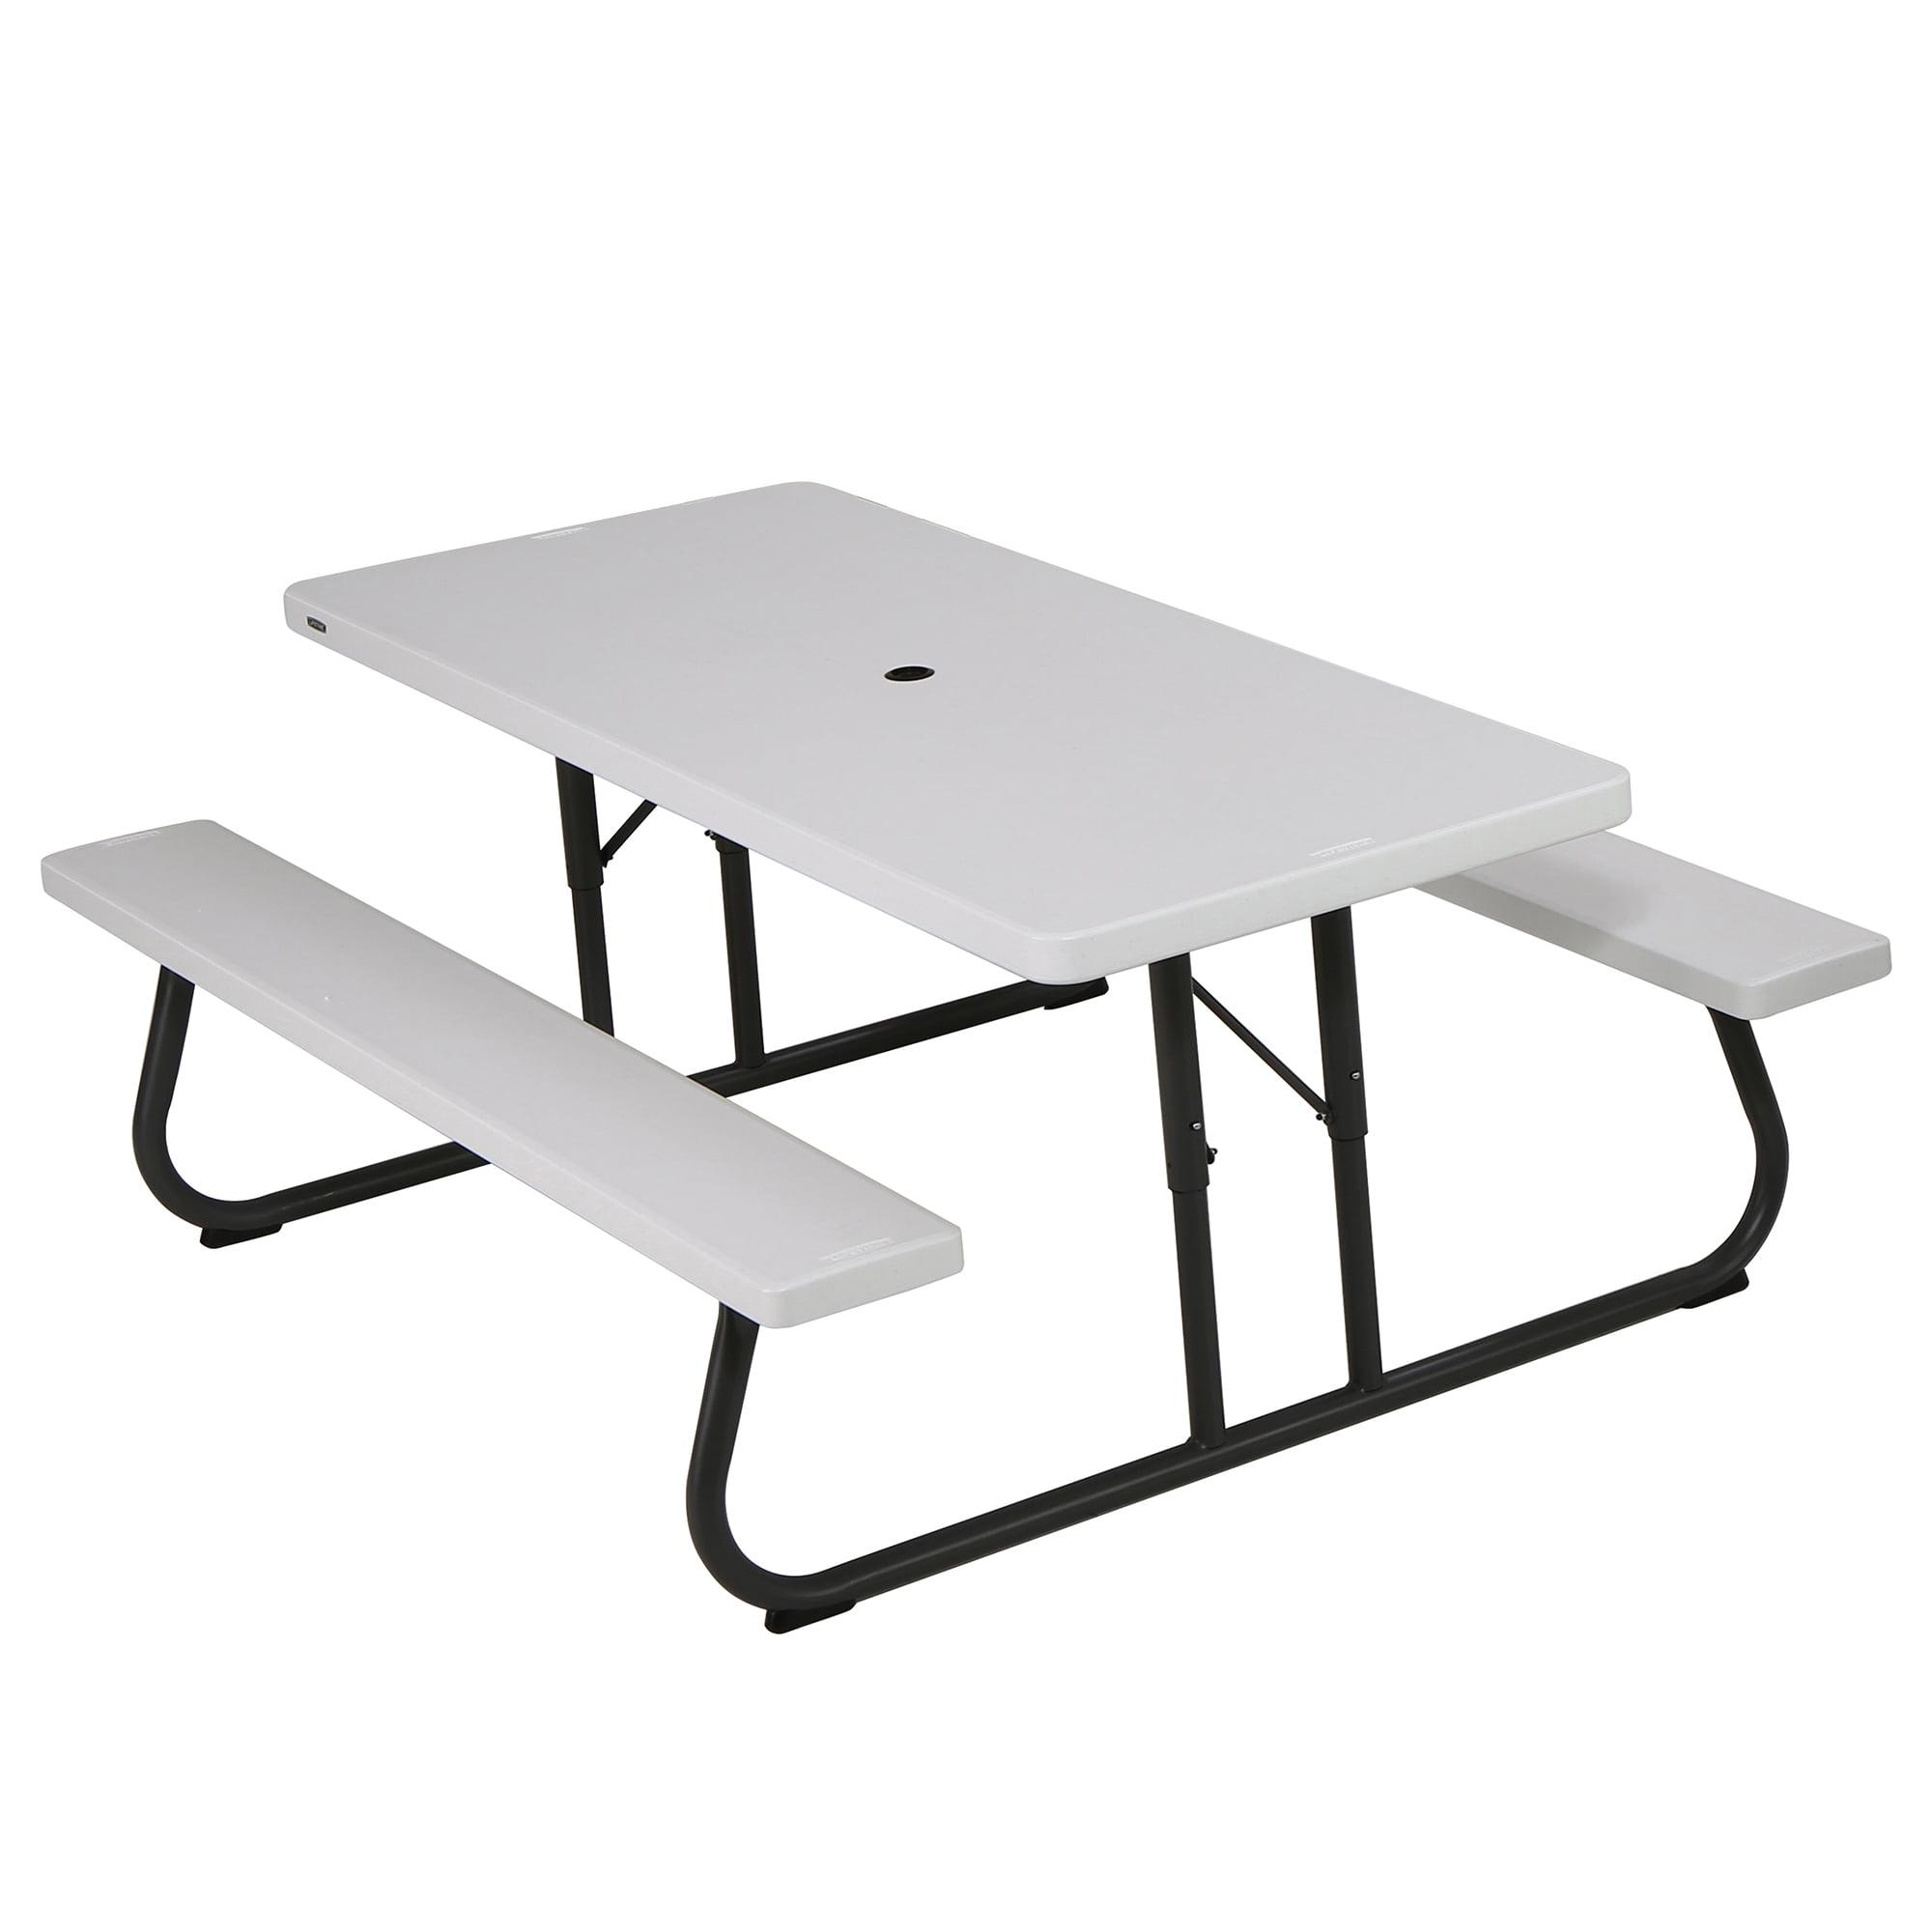 Lifetime 6 foot Picnic Table, White Granite, 80215